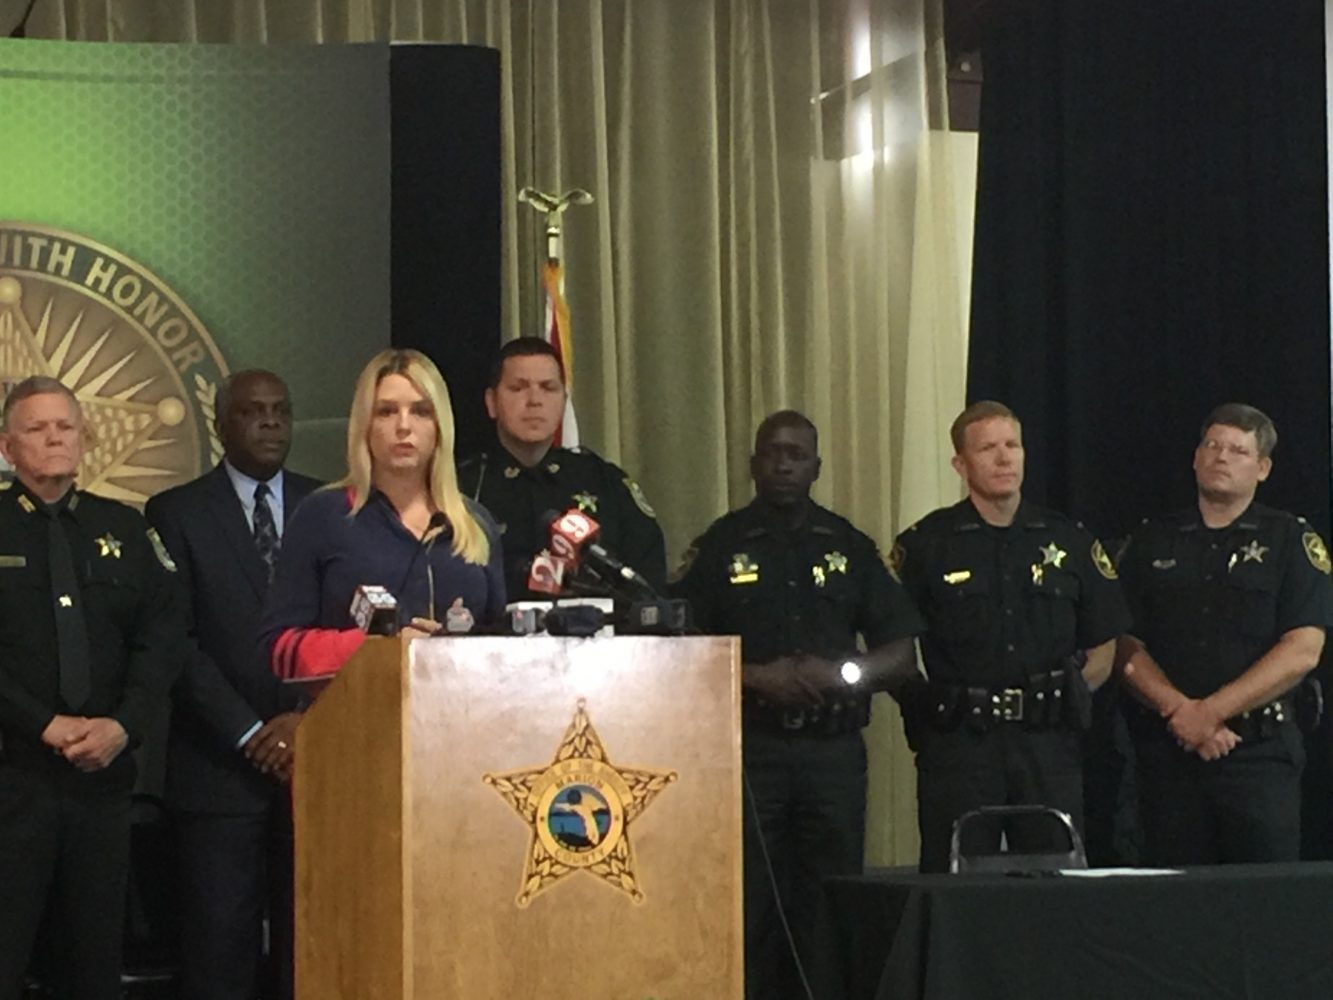 Fla. AG Bondi Signs Emergency Order Outlawing Drug U